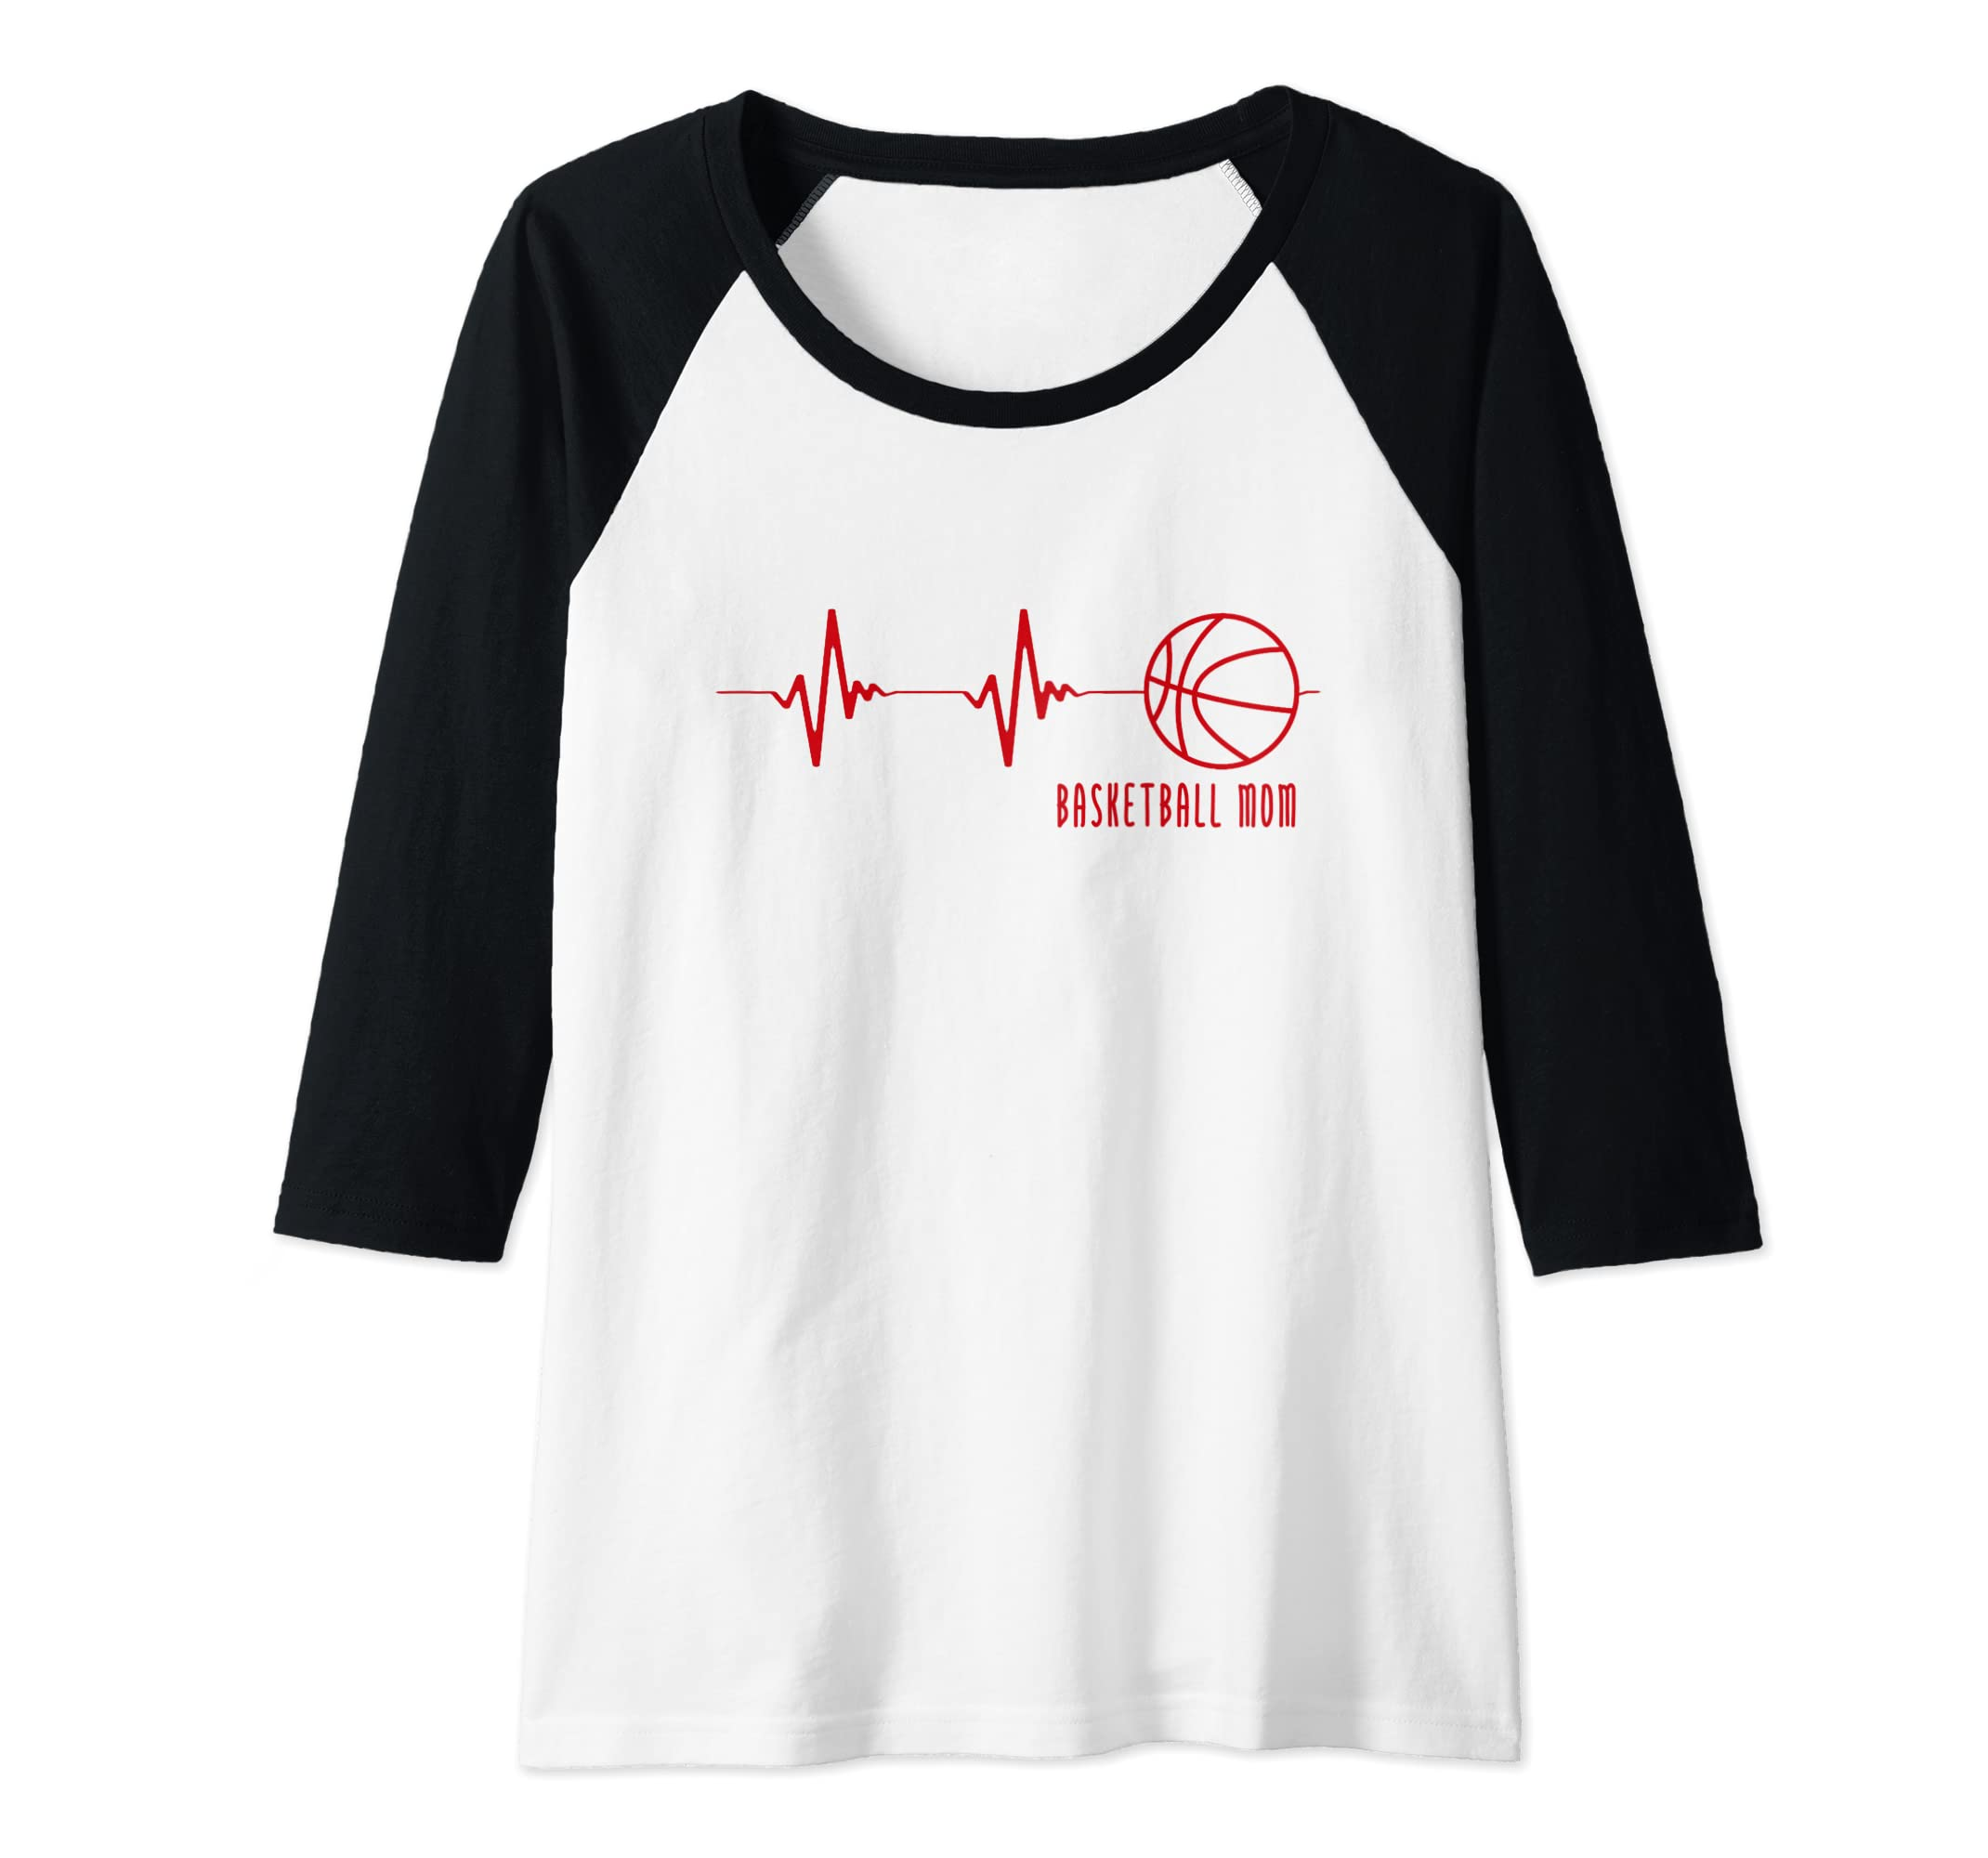 fc427efee40 Amazon.com: Basketball Mom Heartbeat Raglan Baseball Tee: Clothing